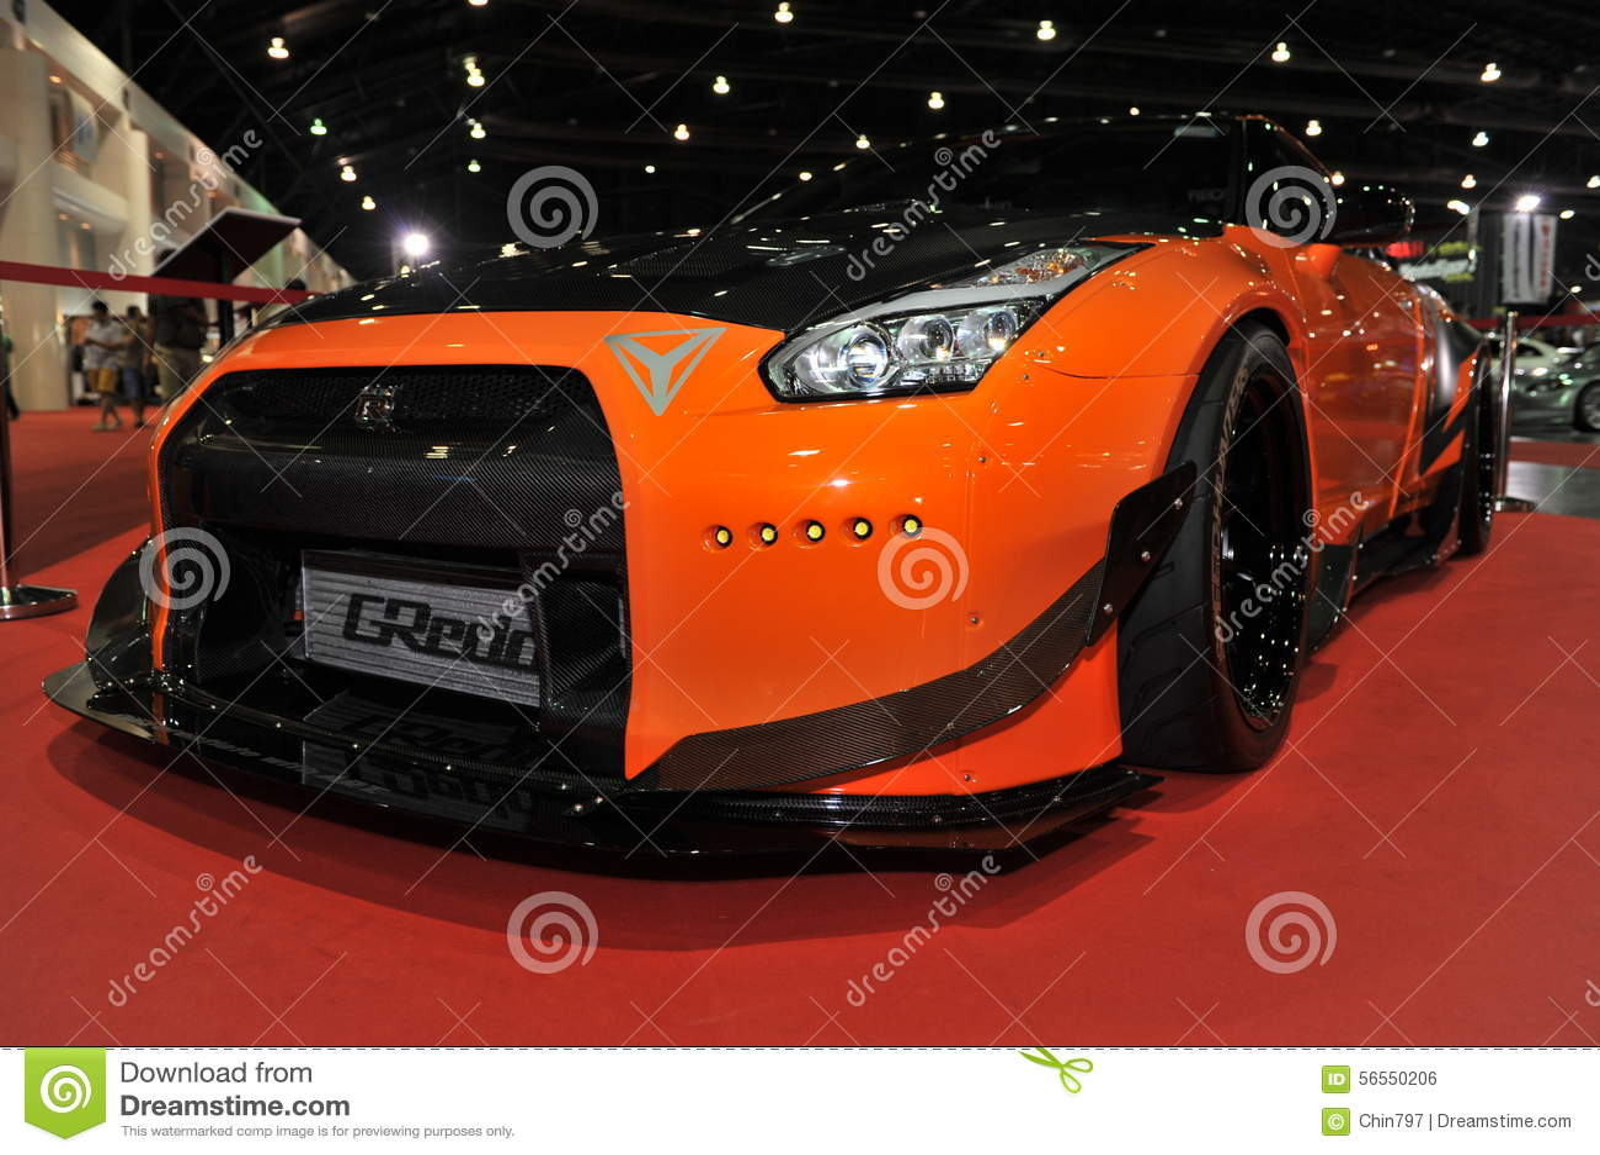 Download Αυτοκίνητο οριζόντων R35 GT-ρ της Nissan στο 3$ο διεθνές Autosalon 2015 της Μπανγκόκ στις 27 Ιουνίου 2015 στη Μπανγκόκ, Thailan Εκδοτική Εικόνες - εικόνα από makeup, κορίτσι: 56550206